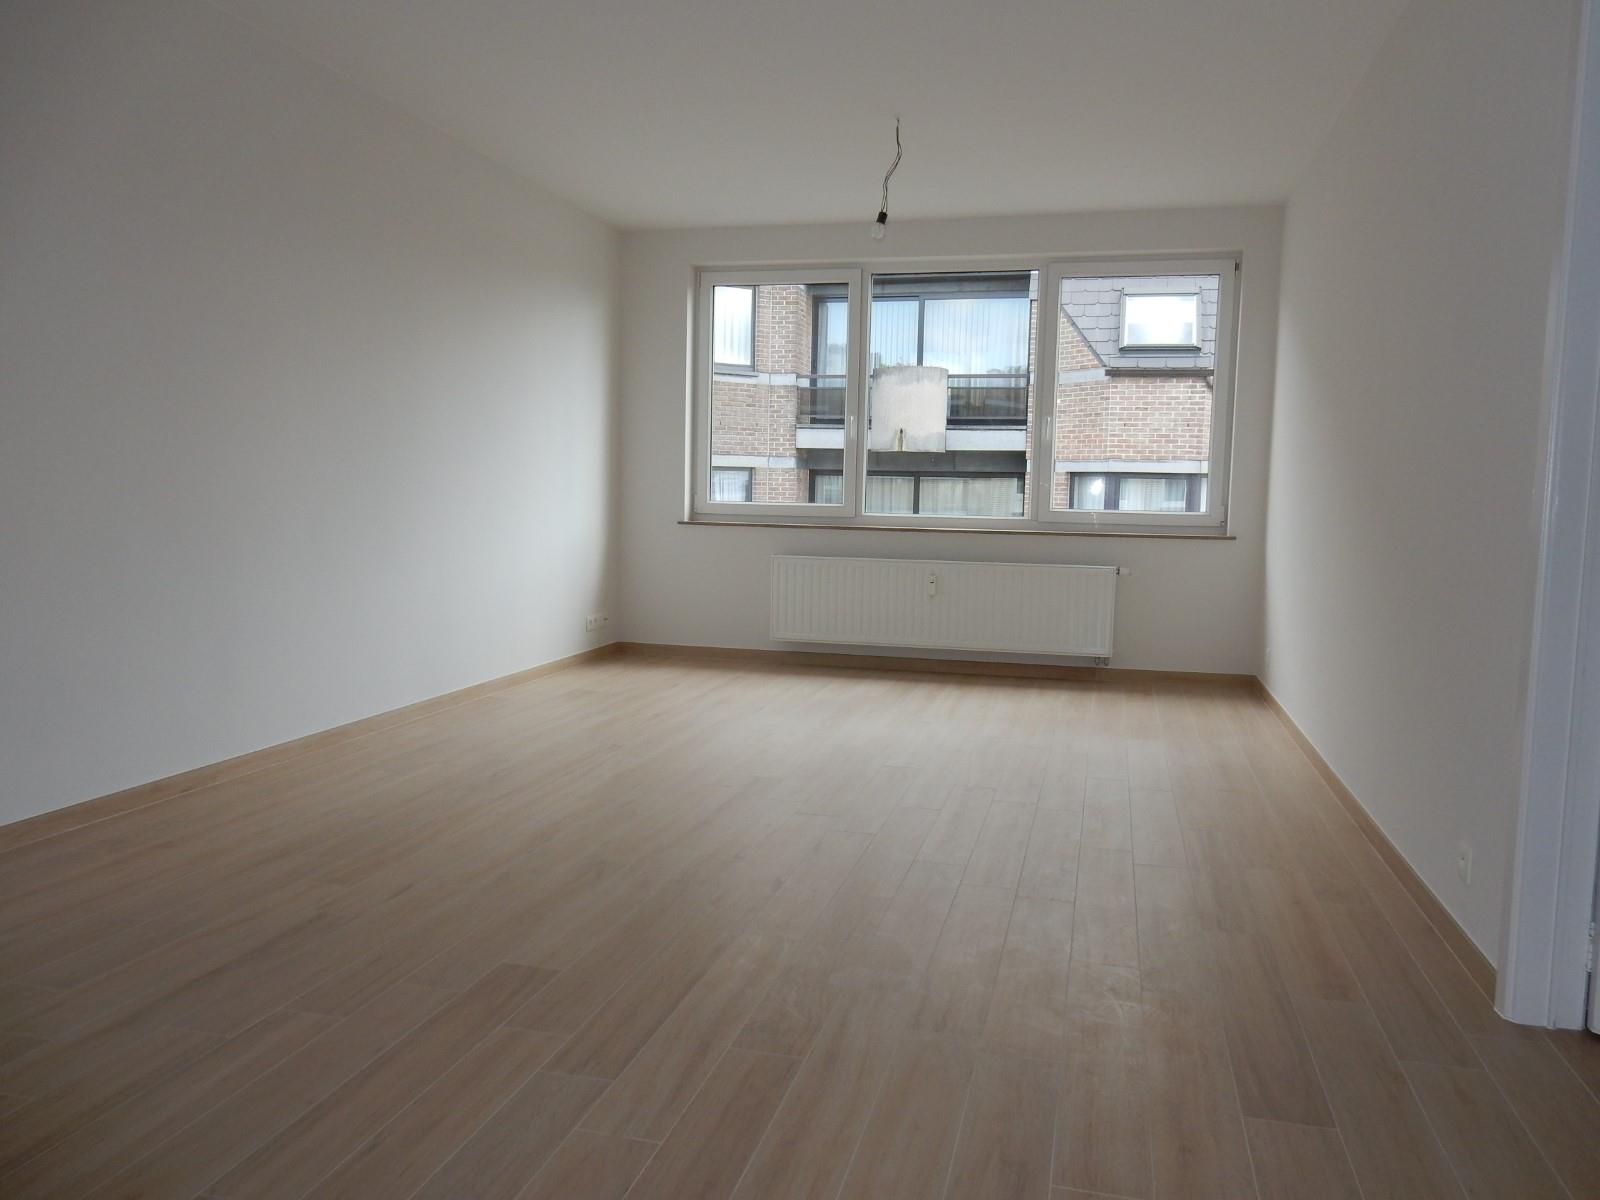 Appartement - Auderghem - #3071643-1